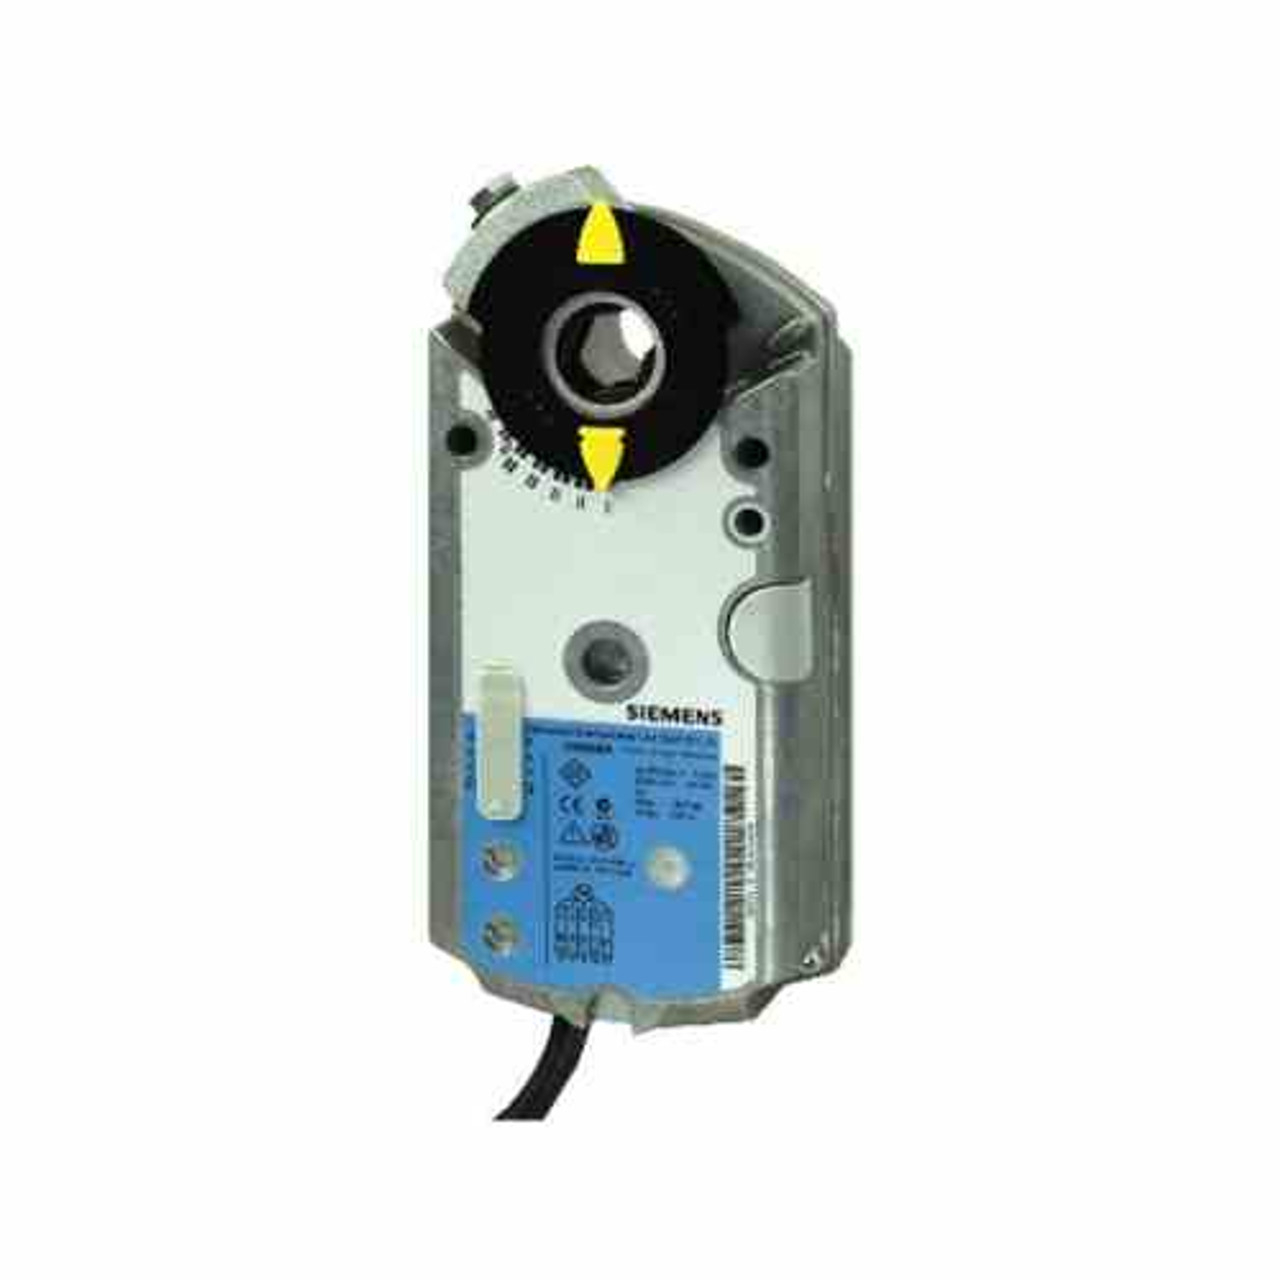 GAP191.1E rotary air damper actuator